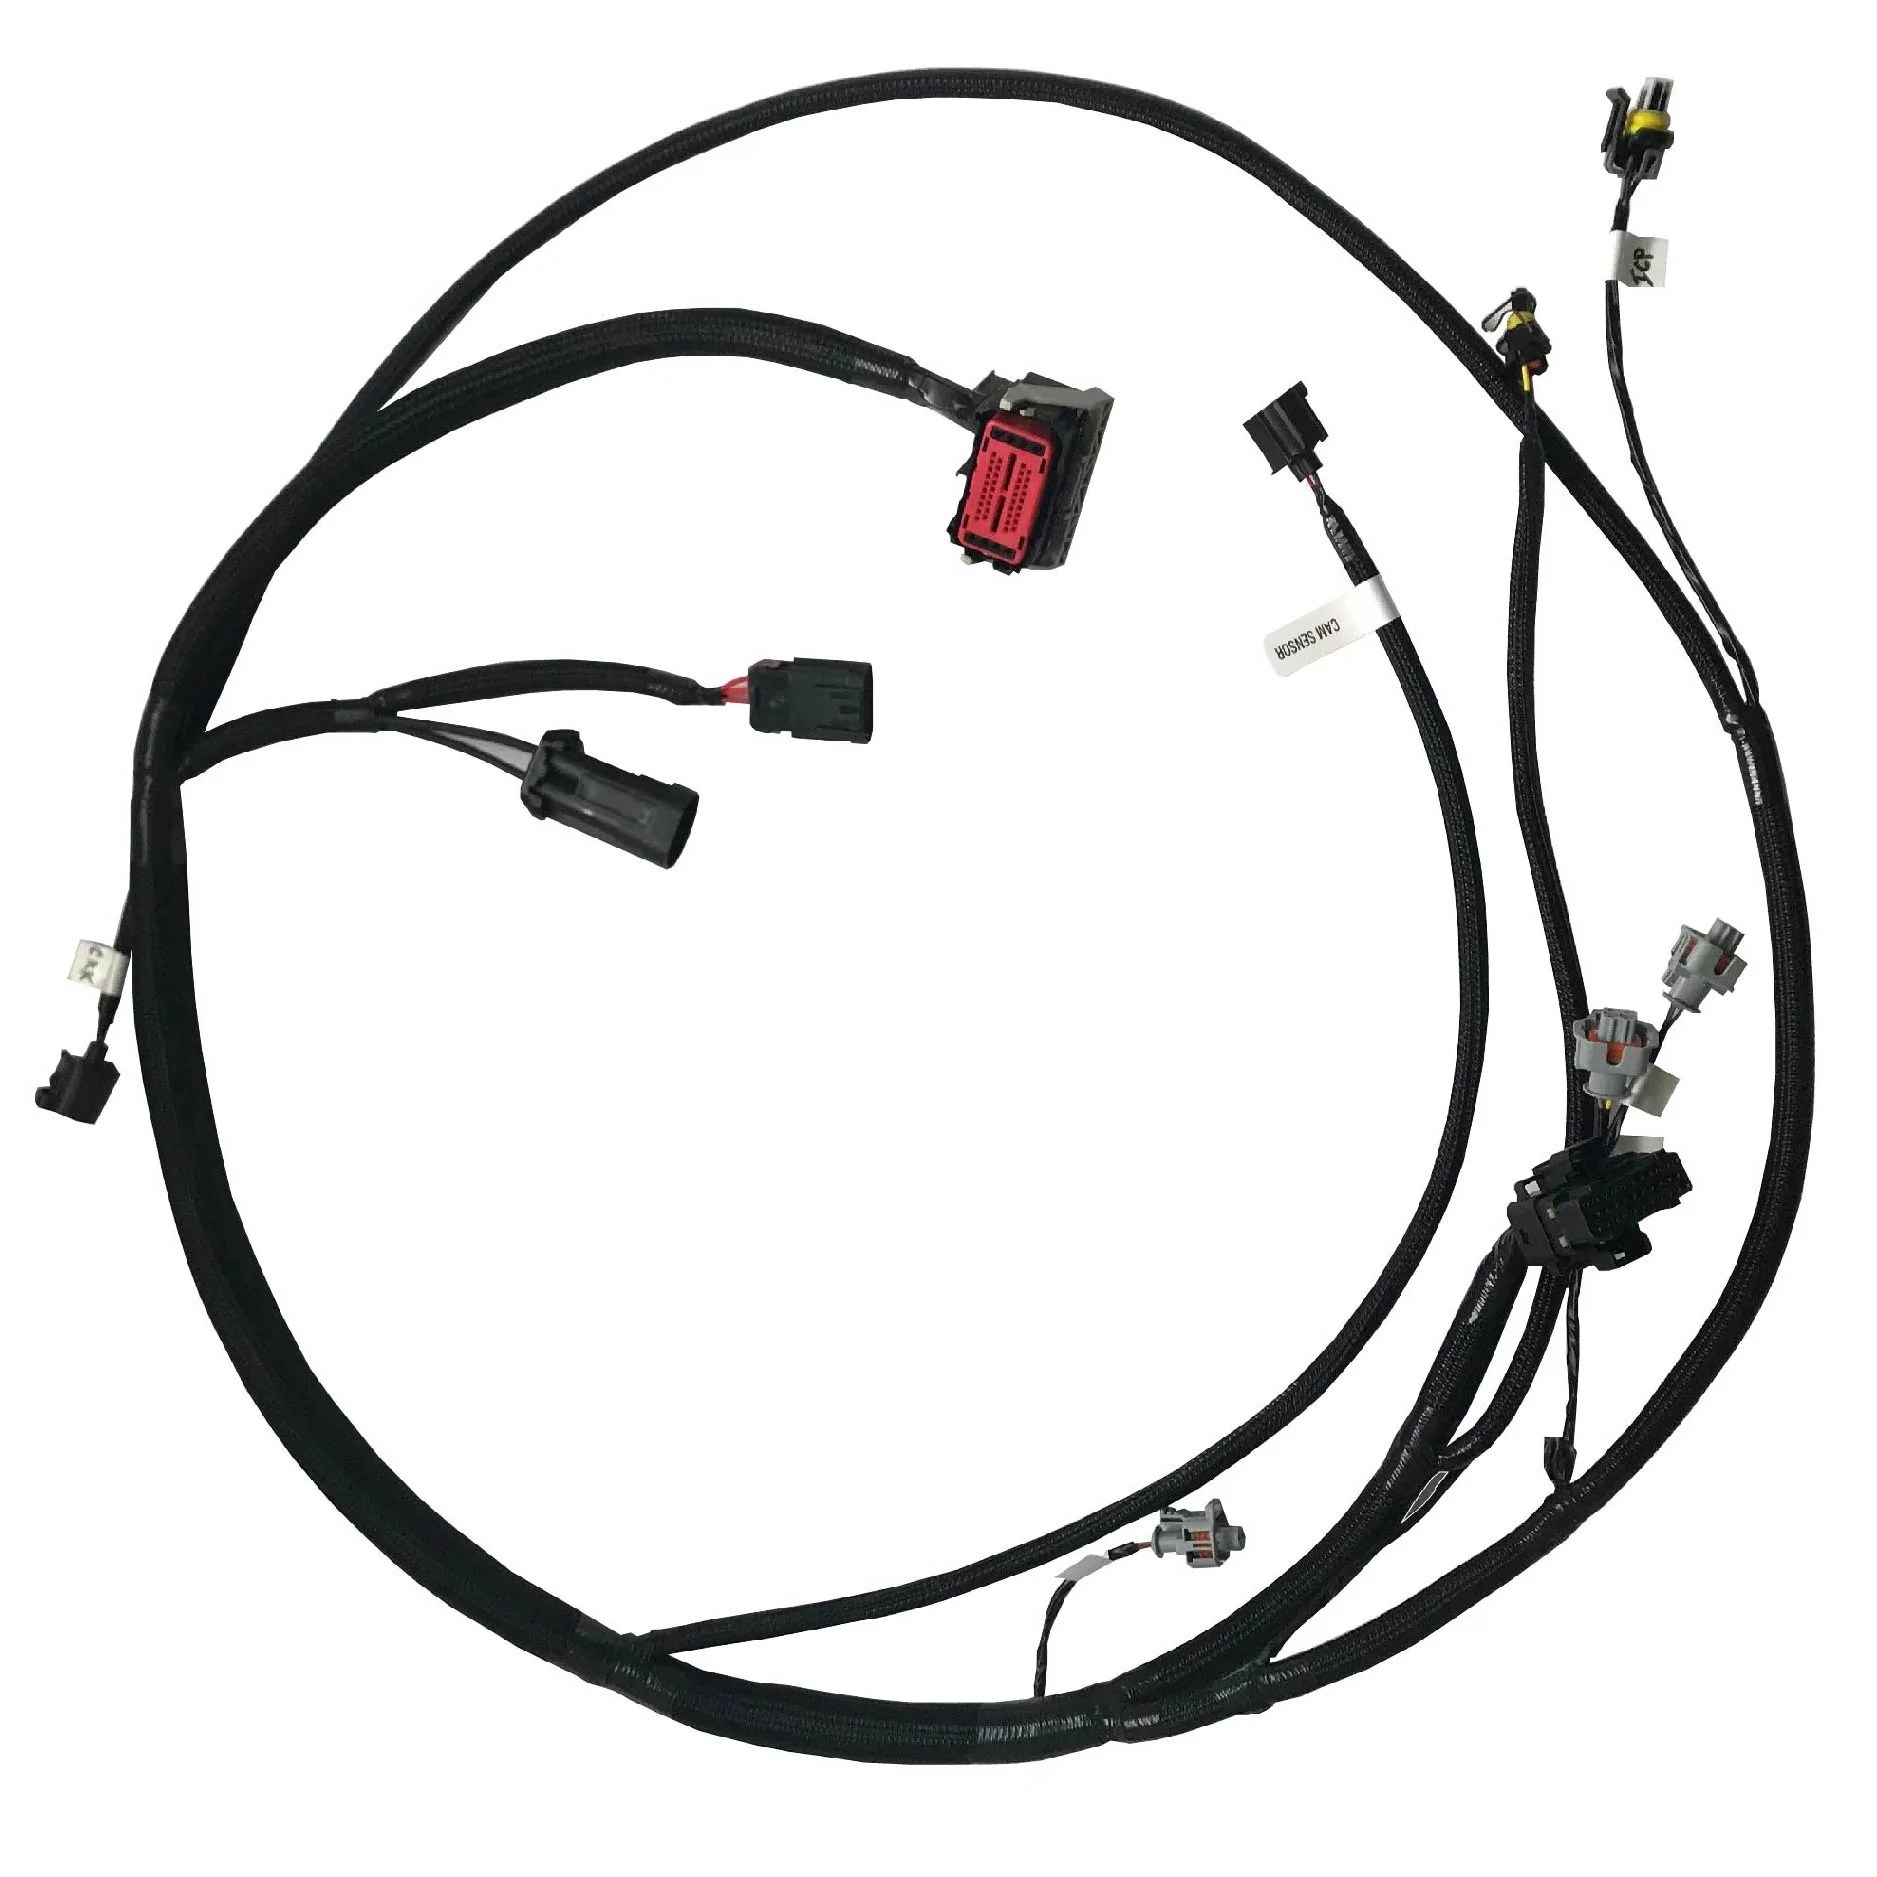 medium resolution of warren diesel injection llc stand alone wire harness 6 0l 6 0 powerstroke wire harness problems powerstroke wire harness